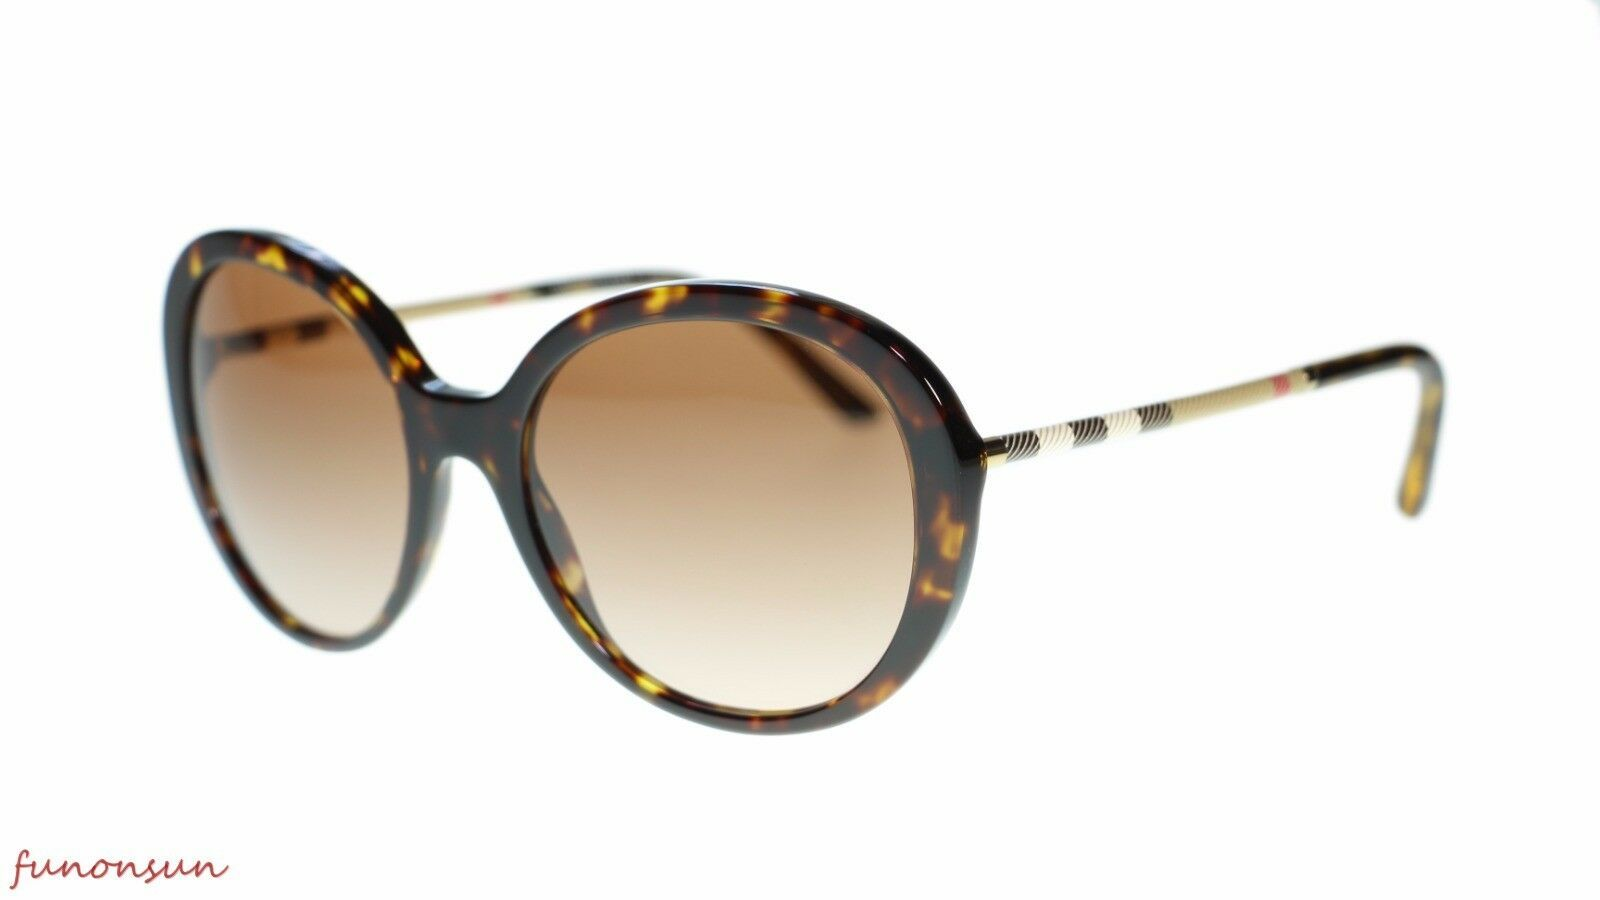 Burberry Women Sunglasses BE4239Q 300213 Havana Brown Gradient Lens 57mm - $163.93